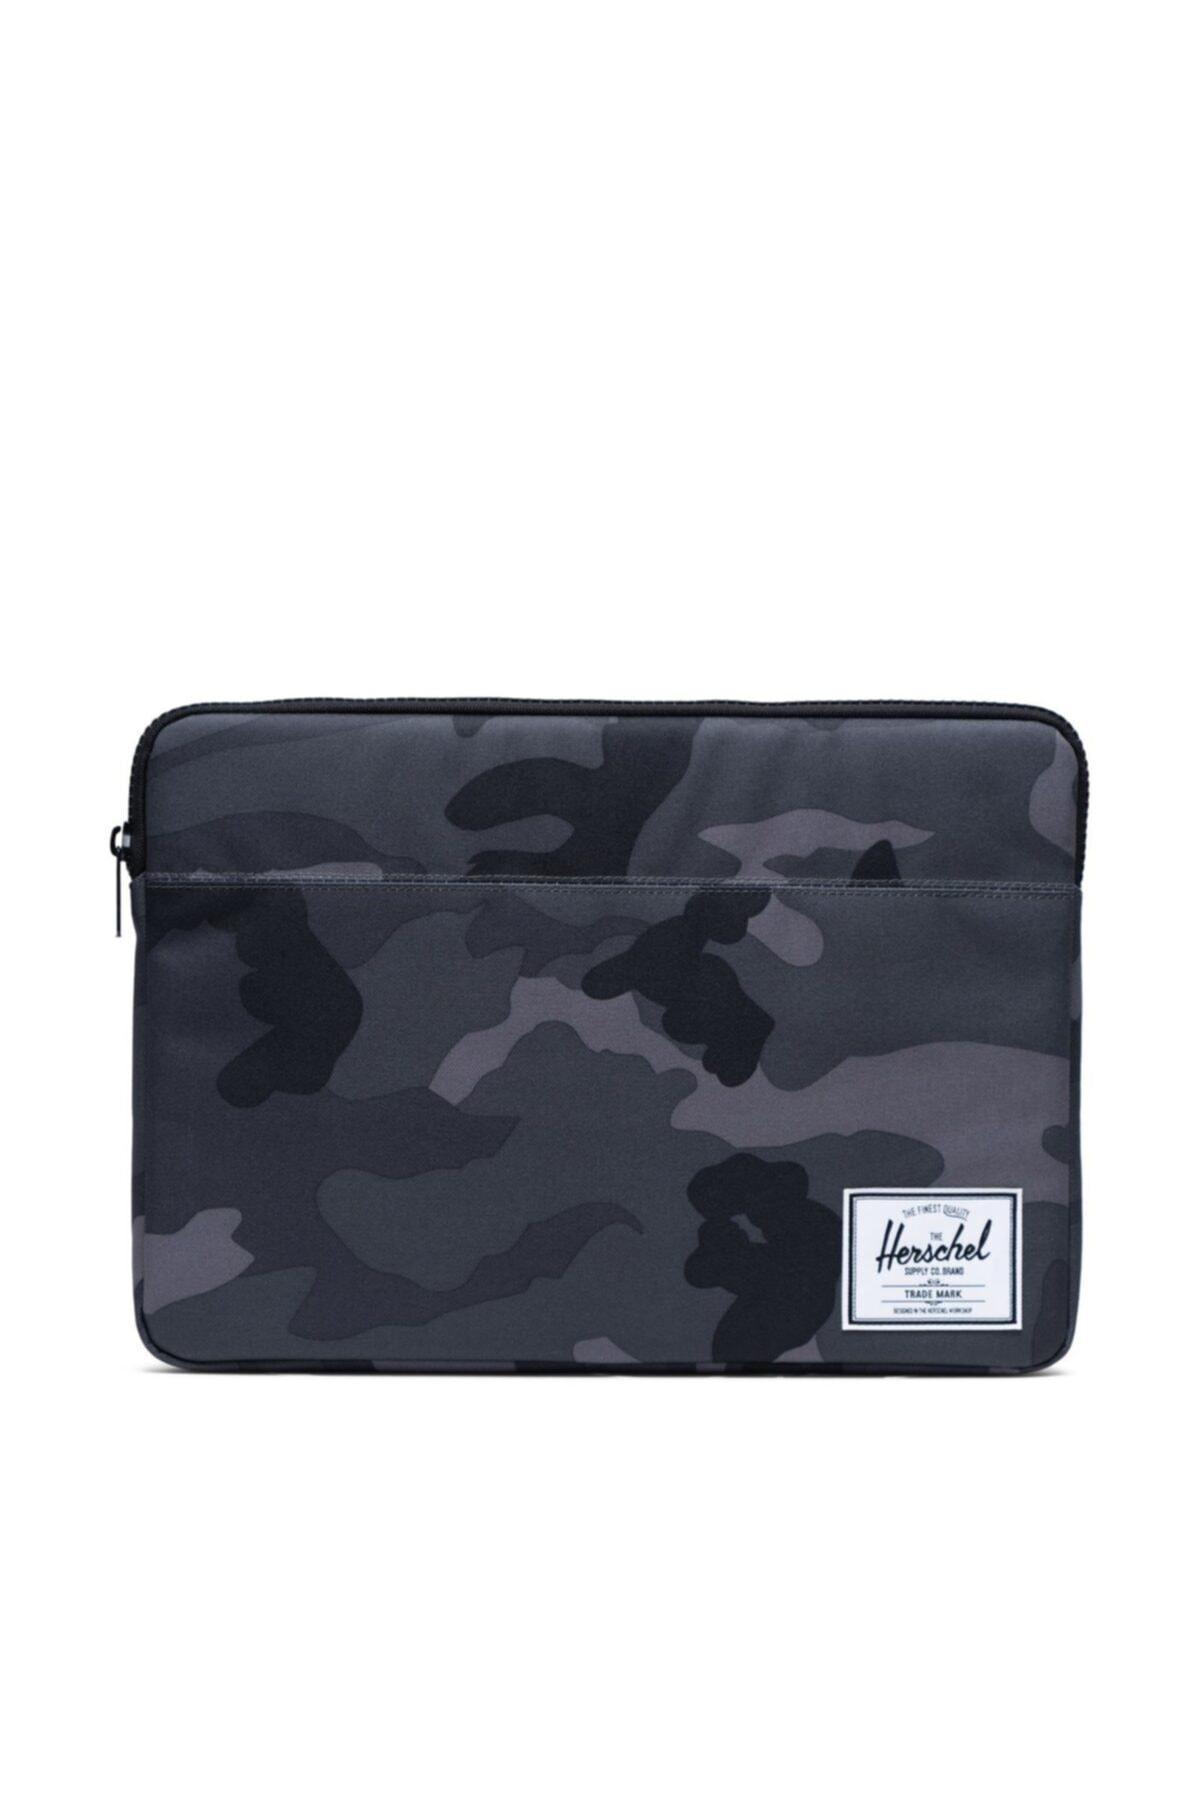 Herschel Supply Co. Herschel Supply Laptop Kılıfı Anchor Sleeve For 15 Inch Macbook Night Camo 1